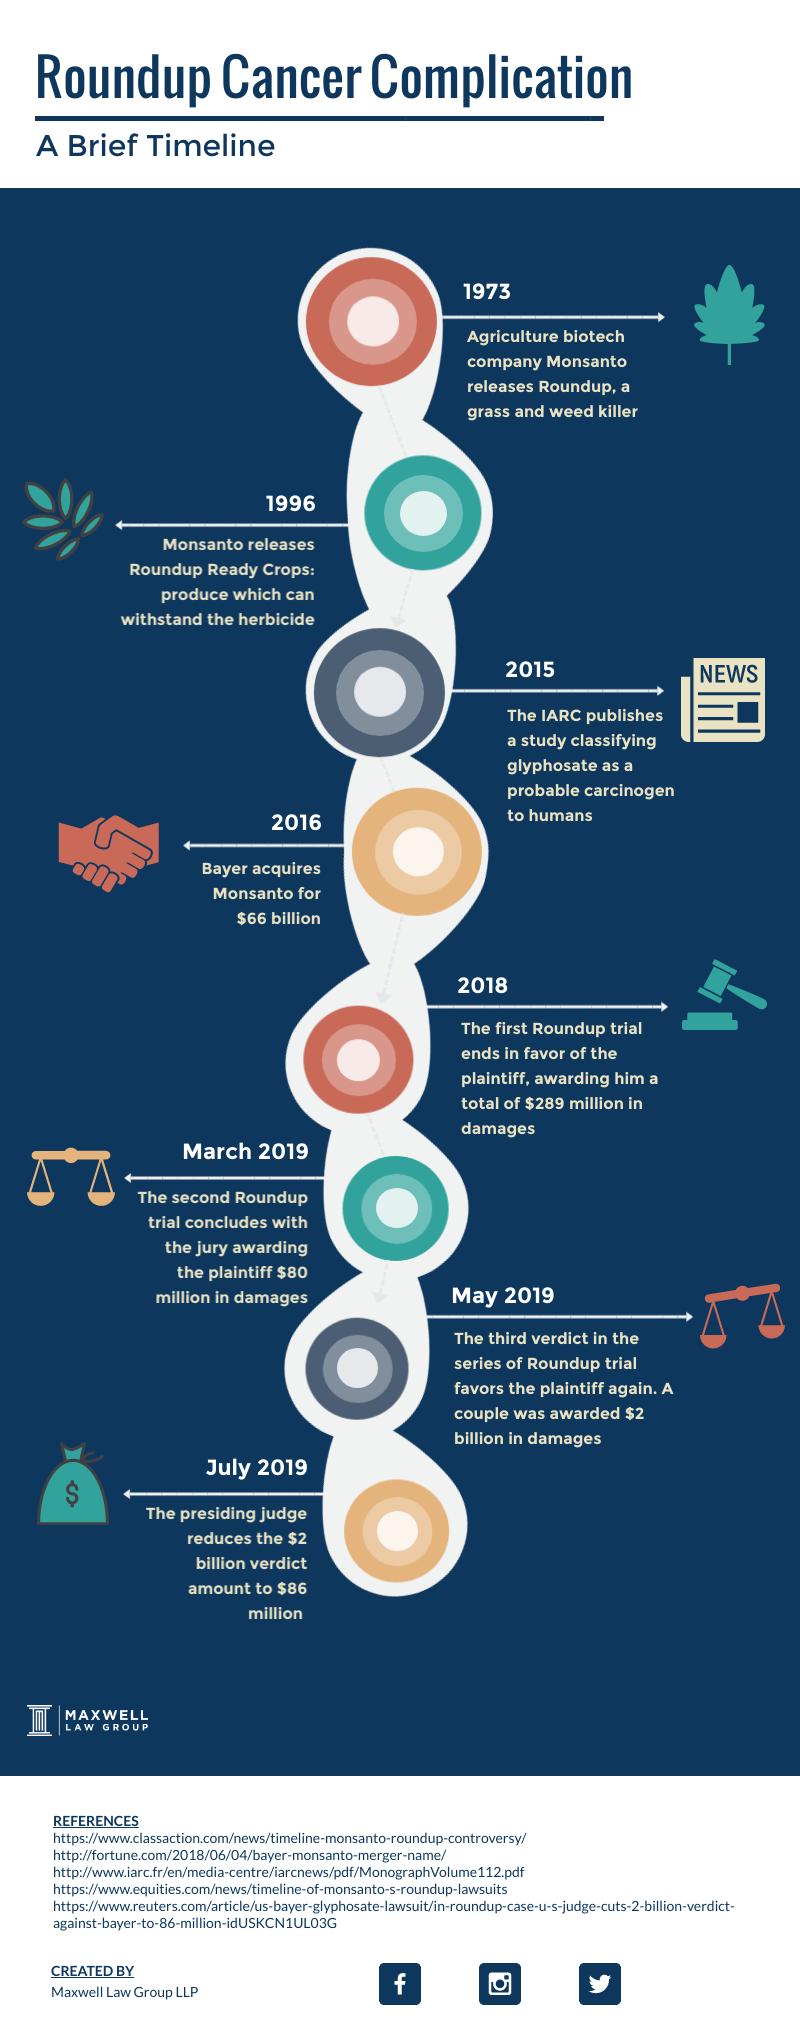 roundup cancer complication timeline